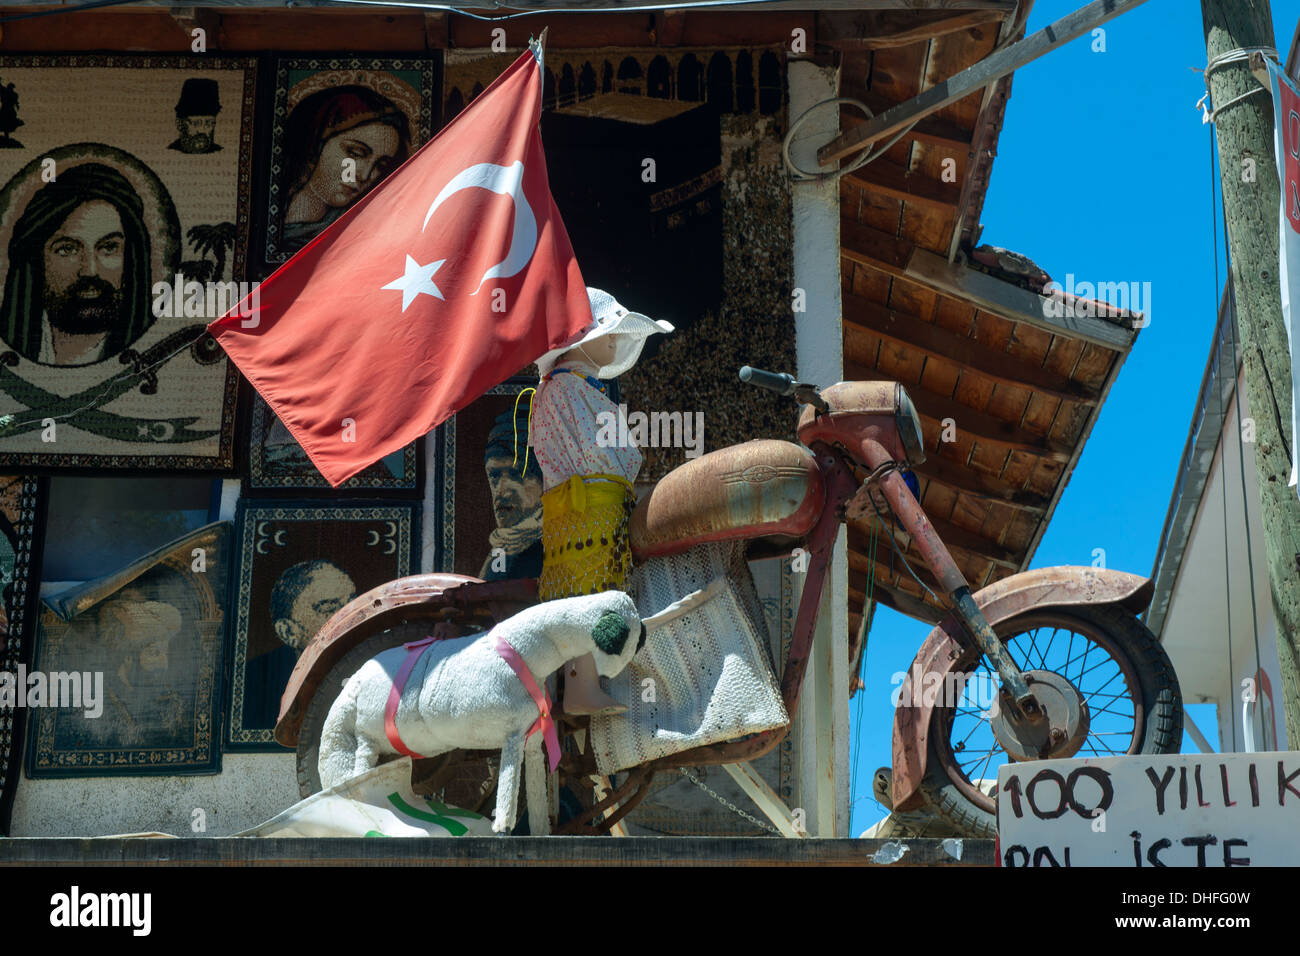 Türkei, Provinz Mugla, Bozburun-Halbinsel, Bayir-Köy, Souvenier-und Antiquitätengeschäft - Stock Image